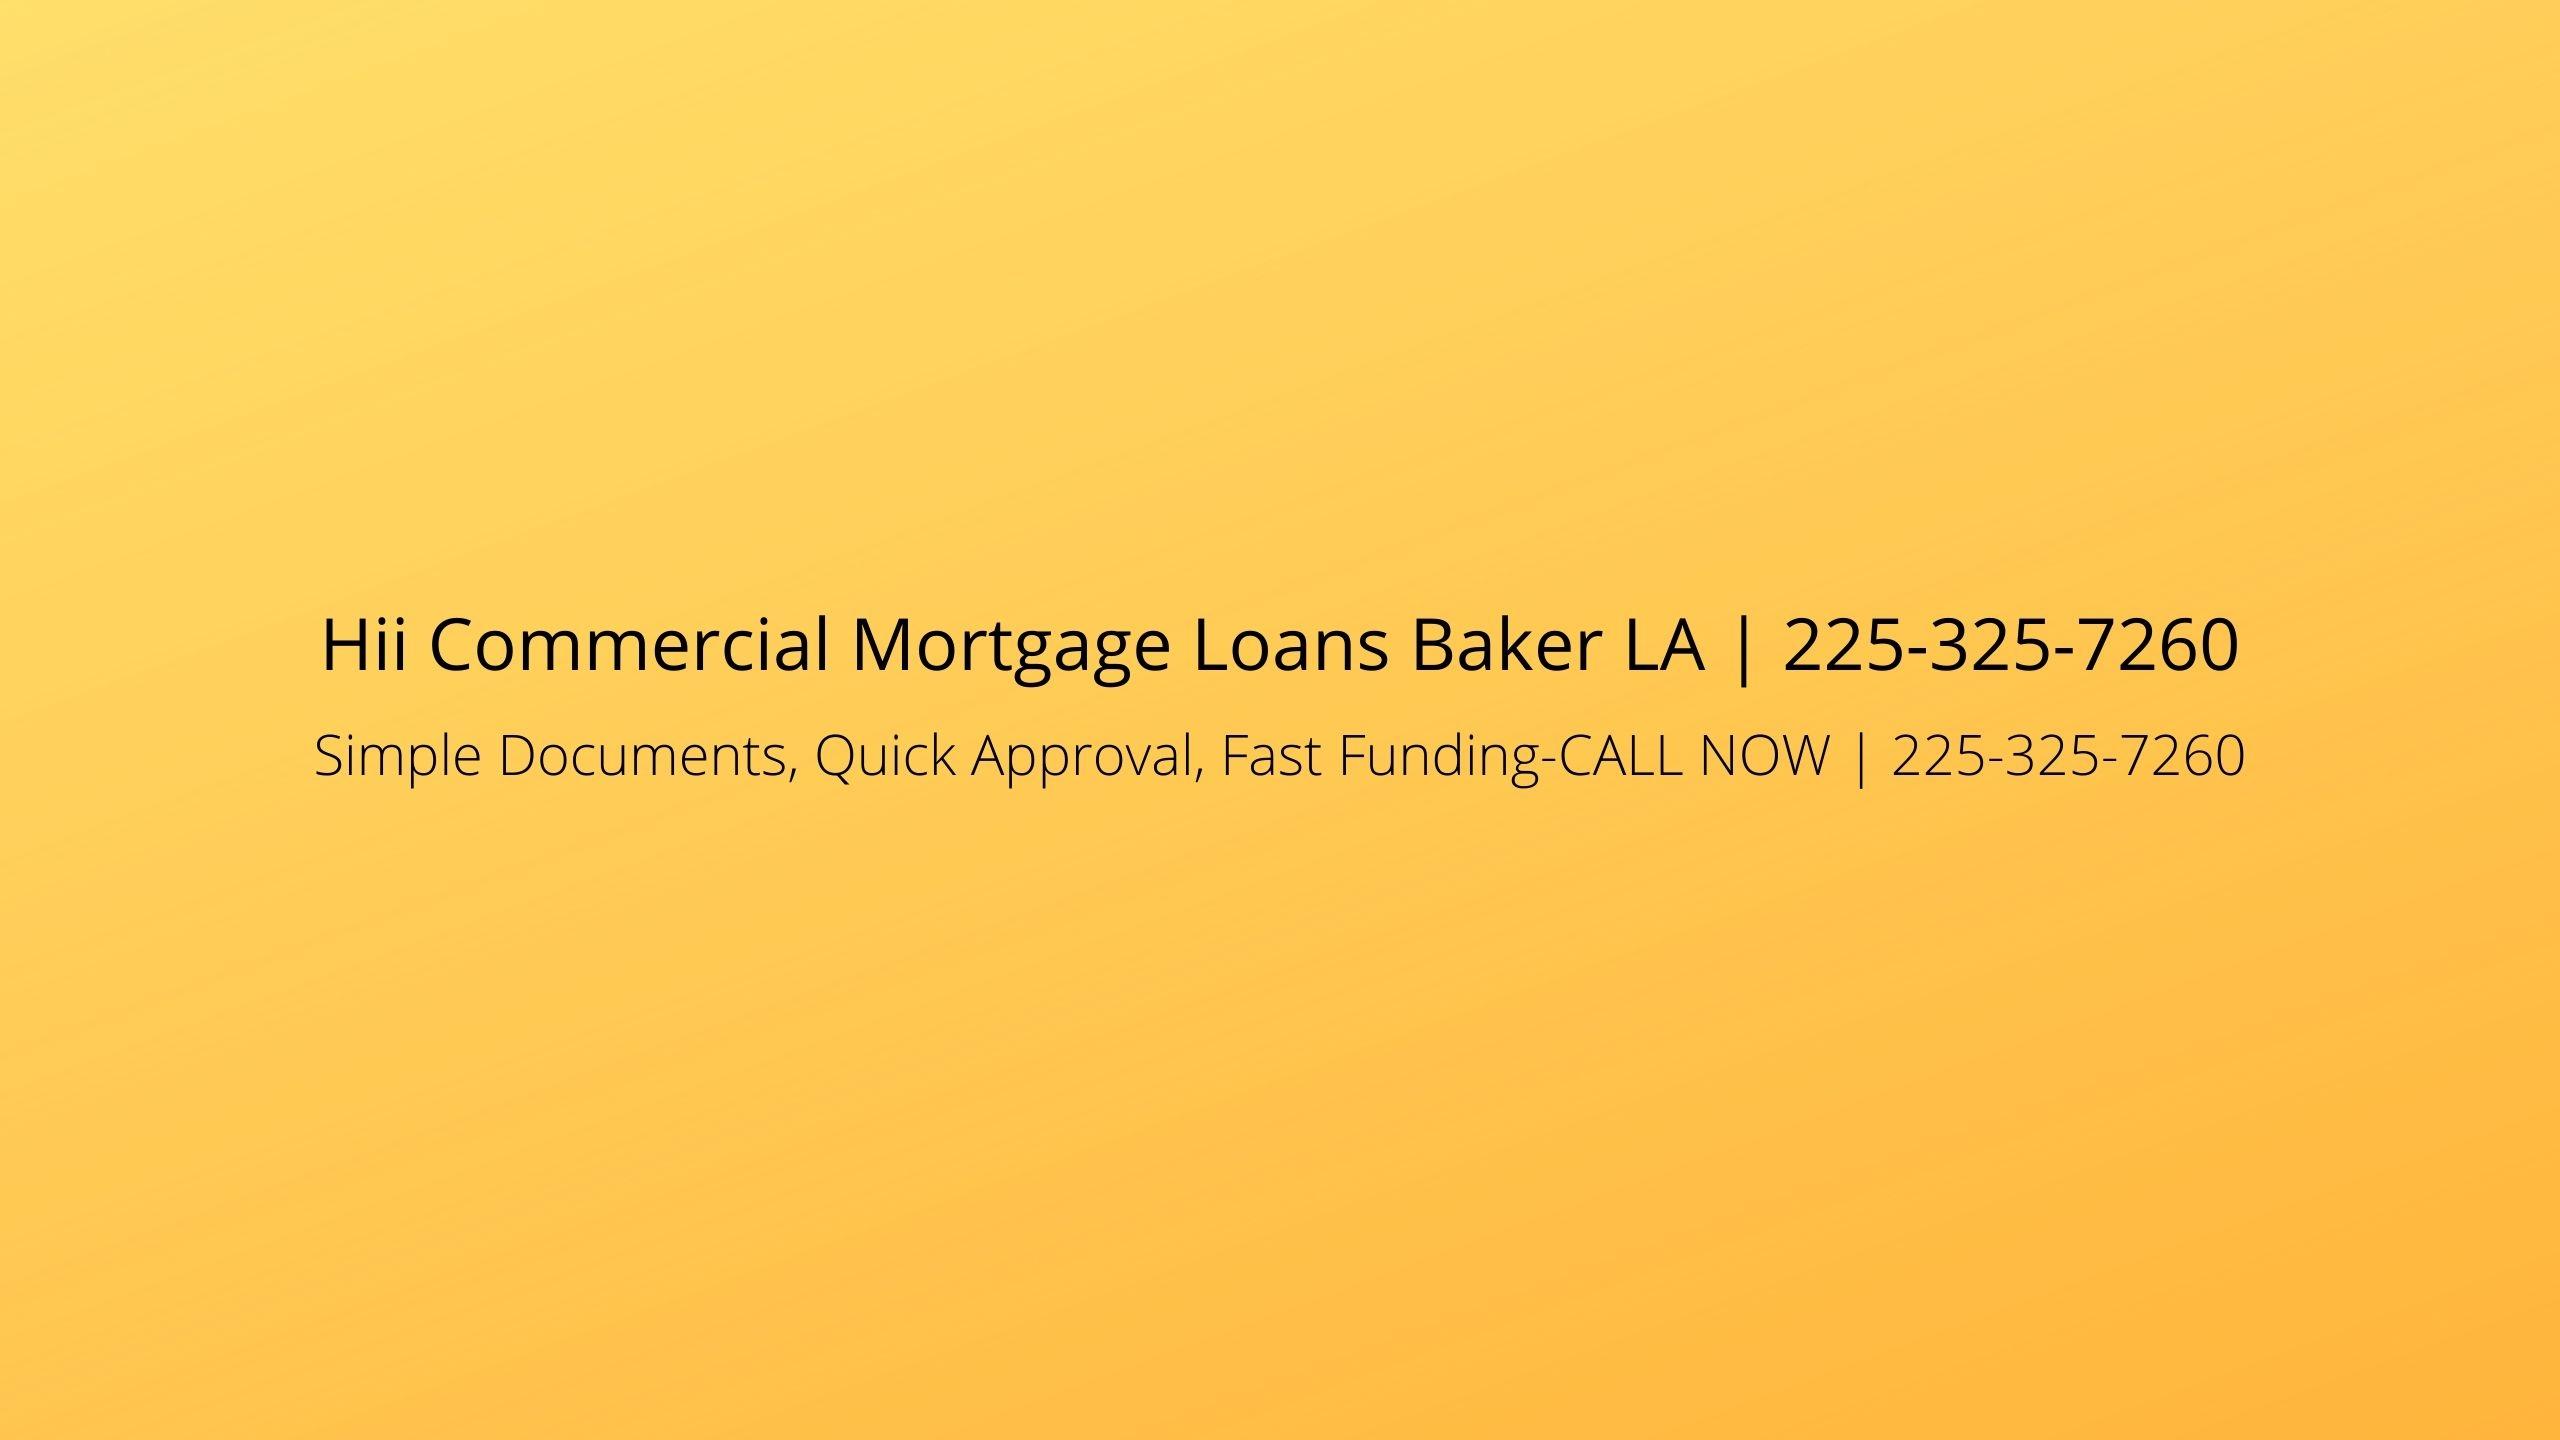 Hii Commercial Mortgage Loans Baker LA (@barcom) Cover Image